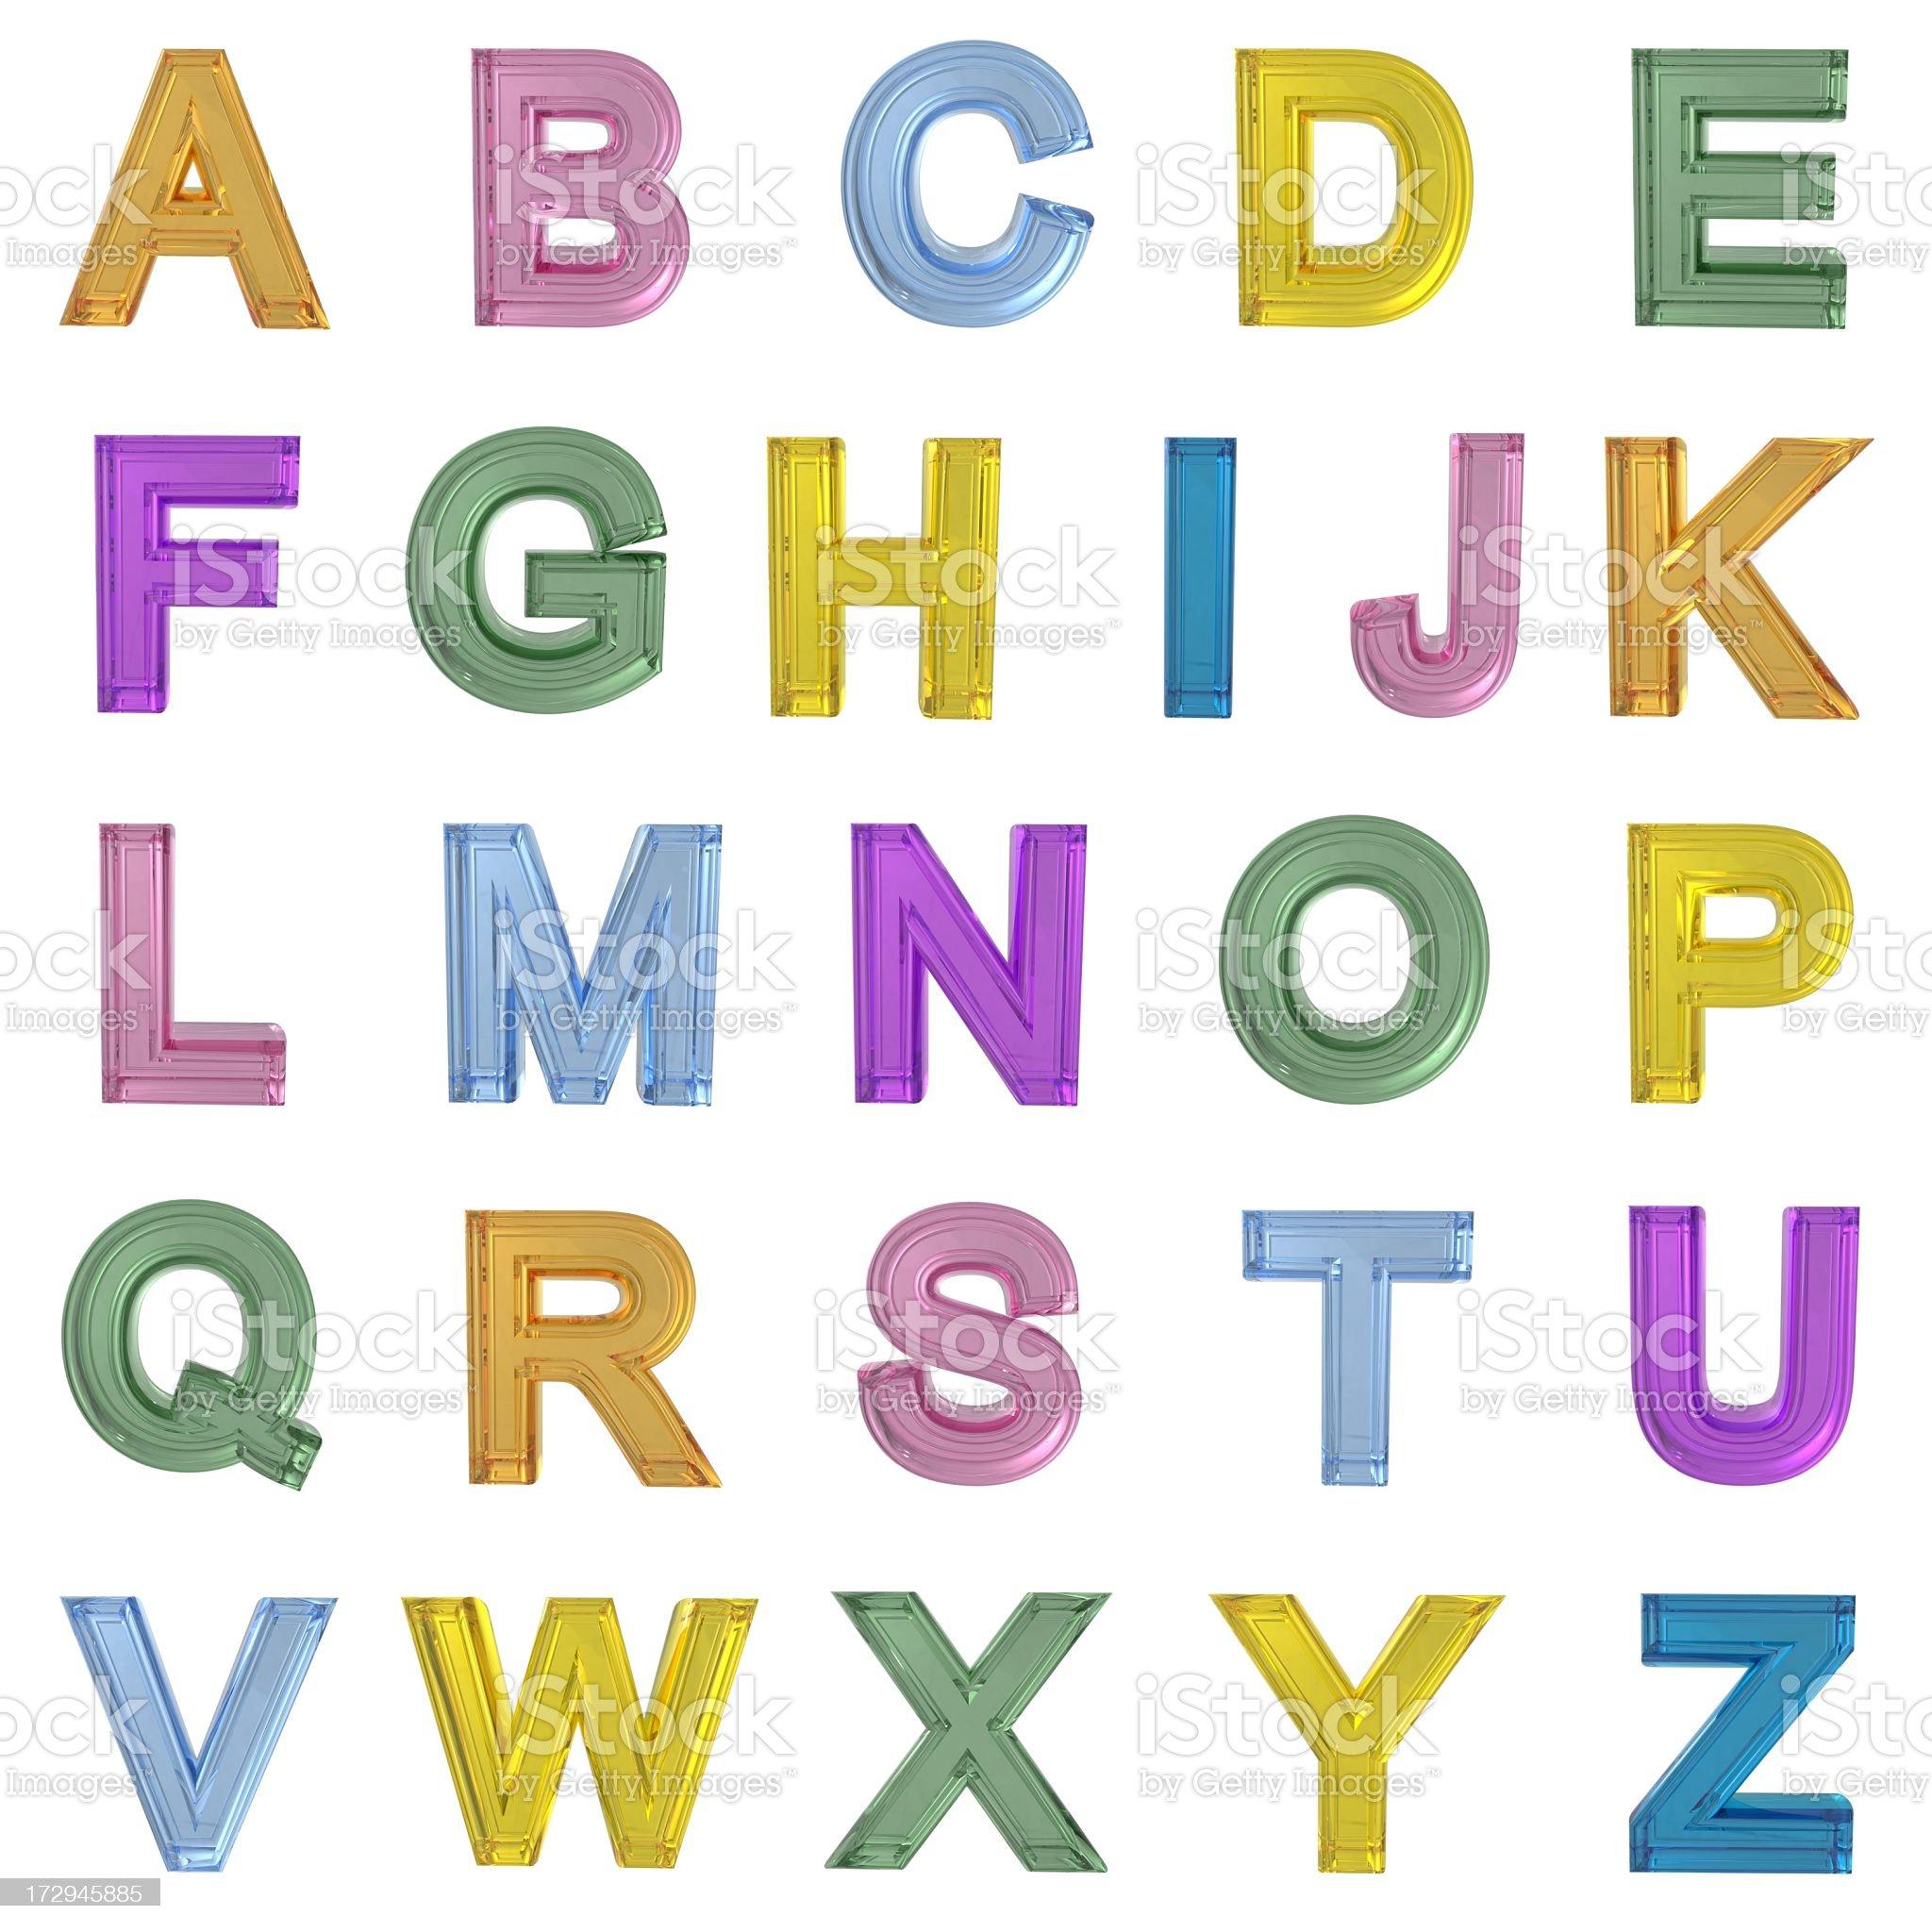 Glass Alphabet royalty-free stock photo